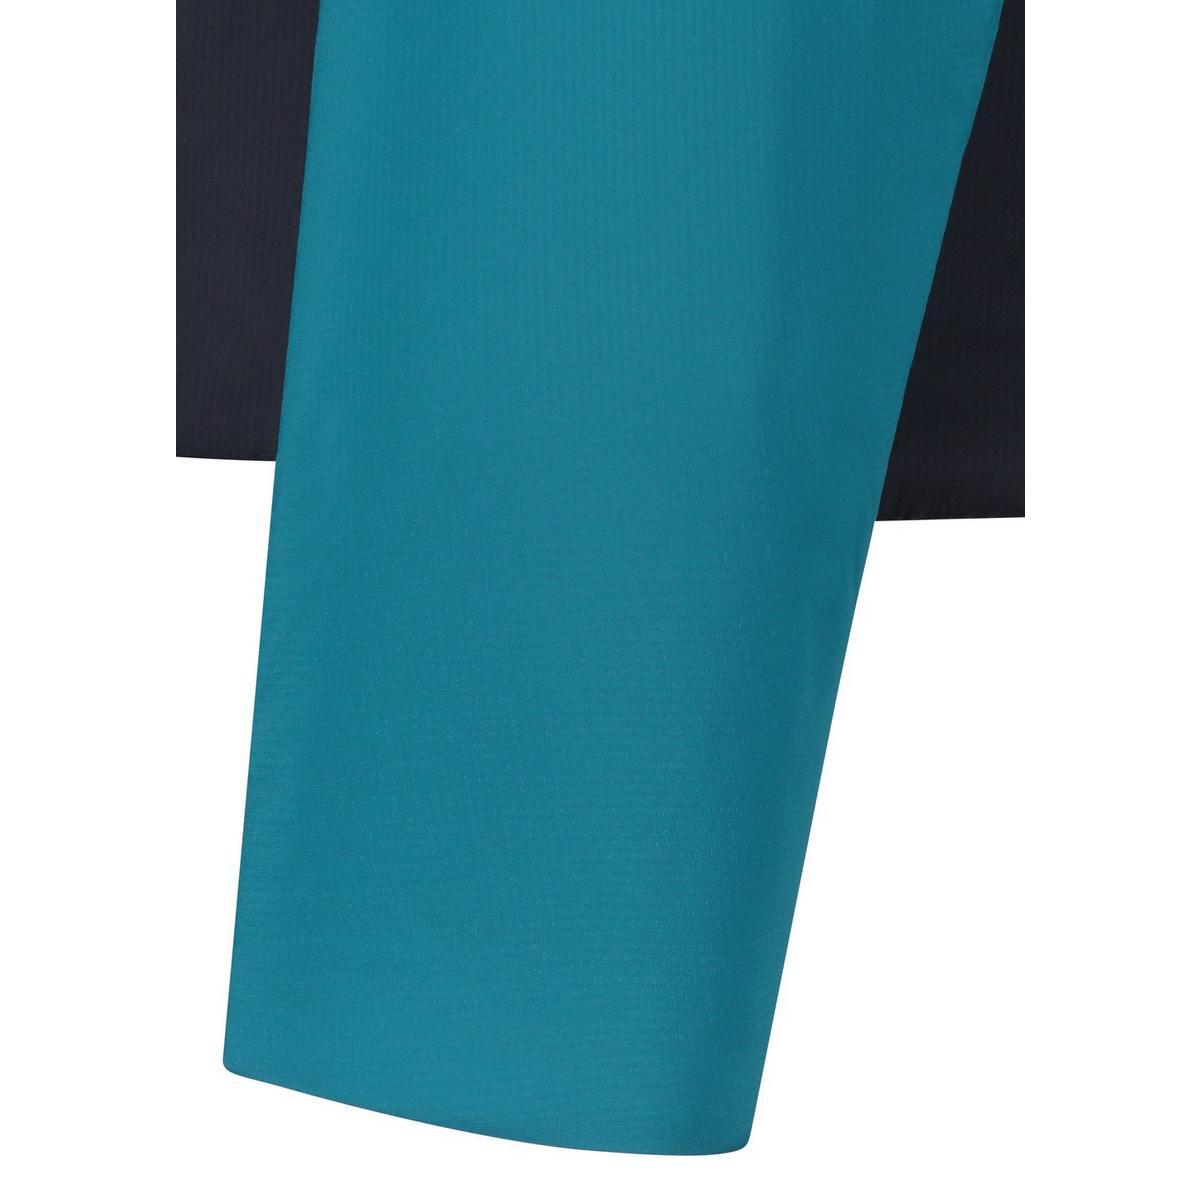 Rab Women's Xenair Jacket - Ultramarine